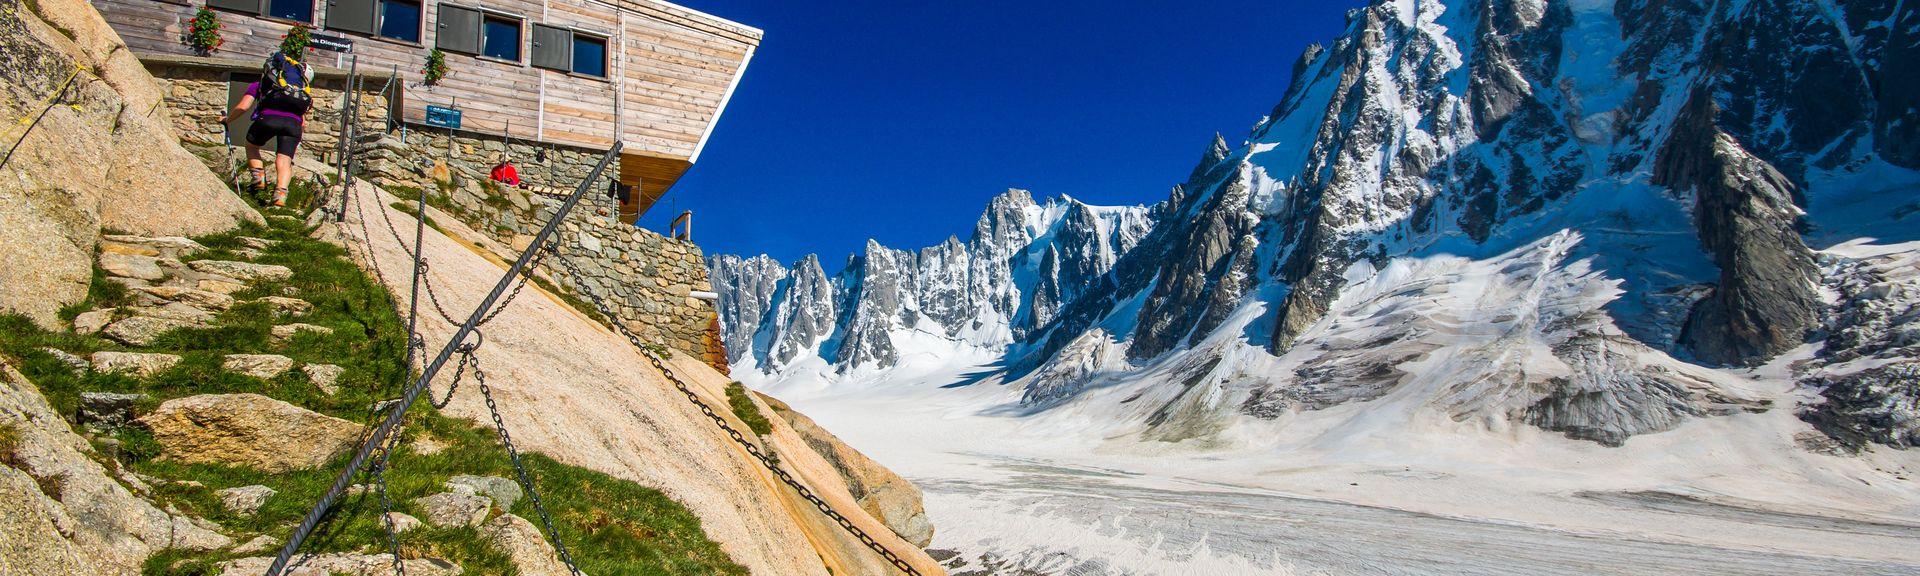 Argentière, Auvérnia-Ródano-Alpes, França